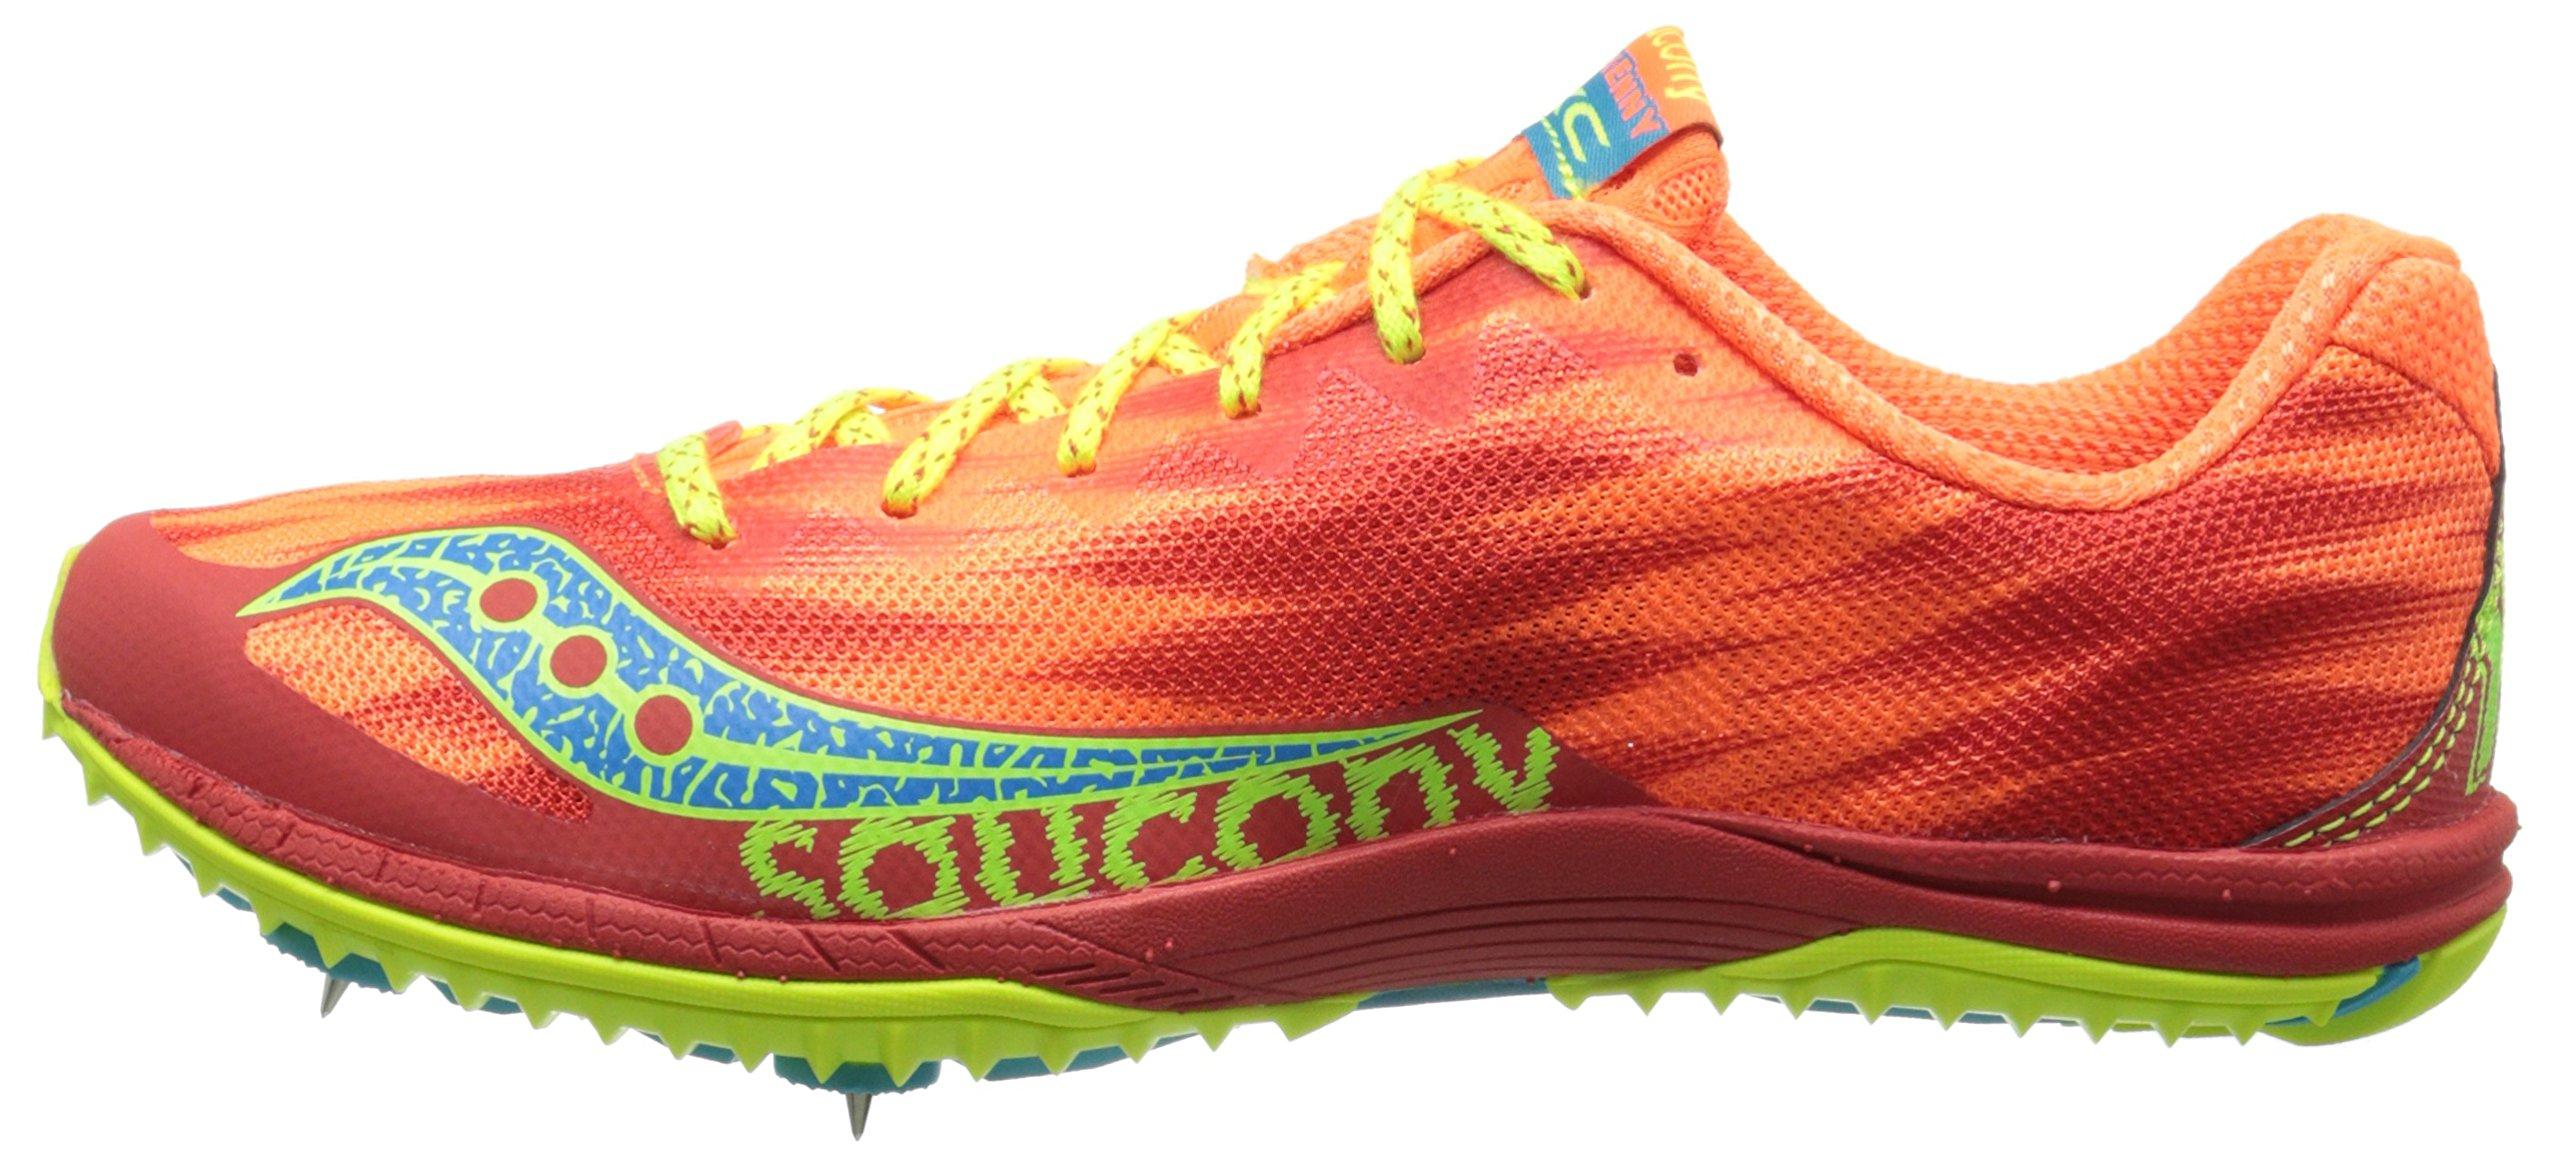 Saucony Womens Kilkenny XC Mesh Athletic Running, Cross Training Shoes